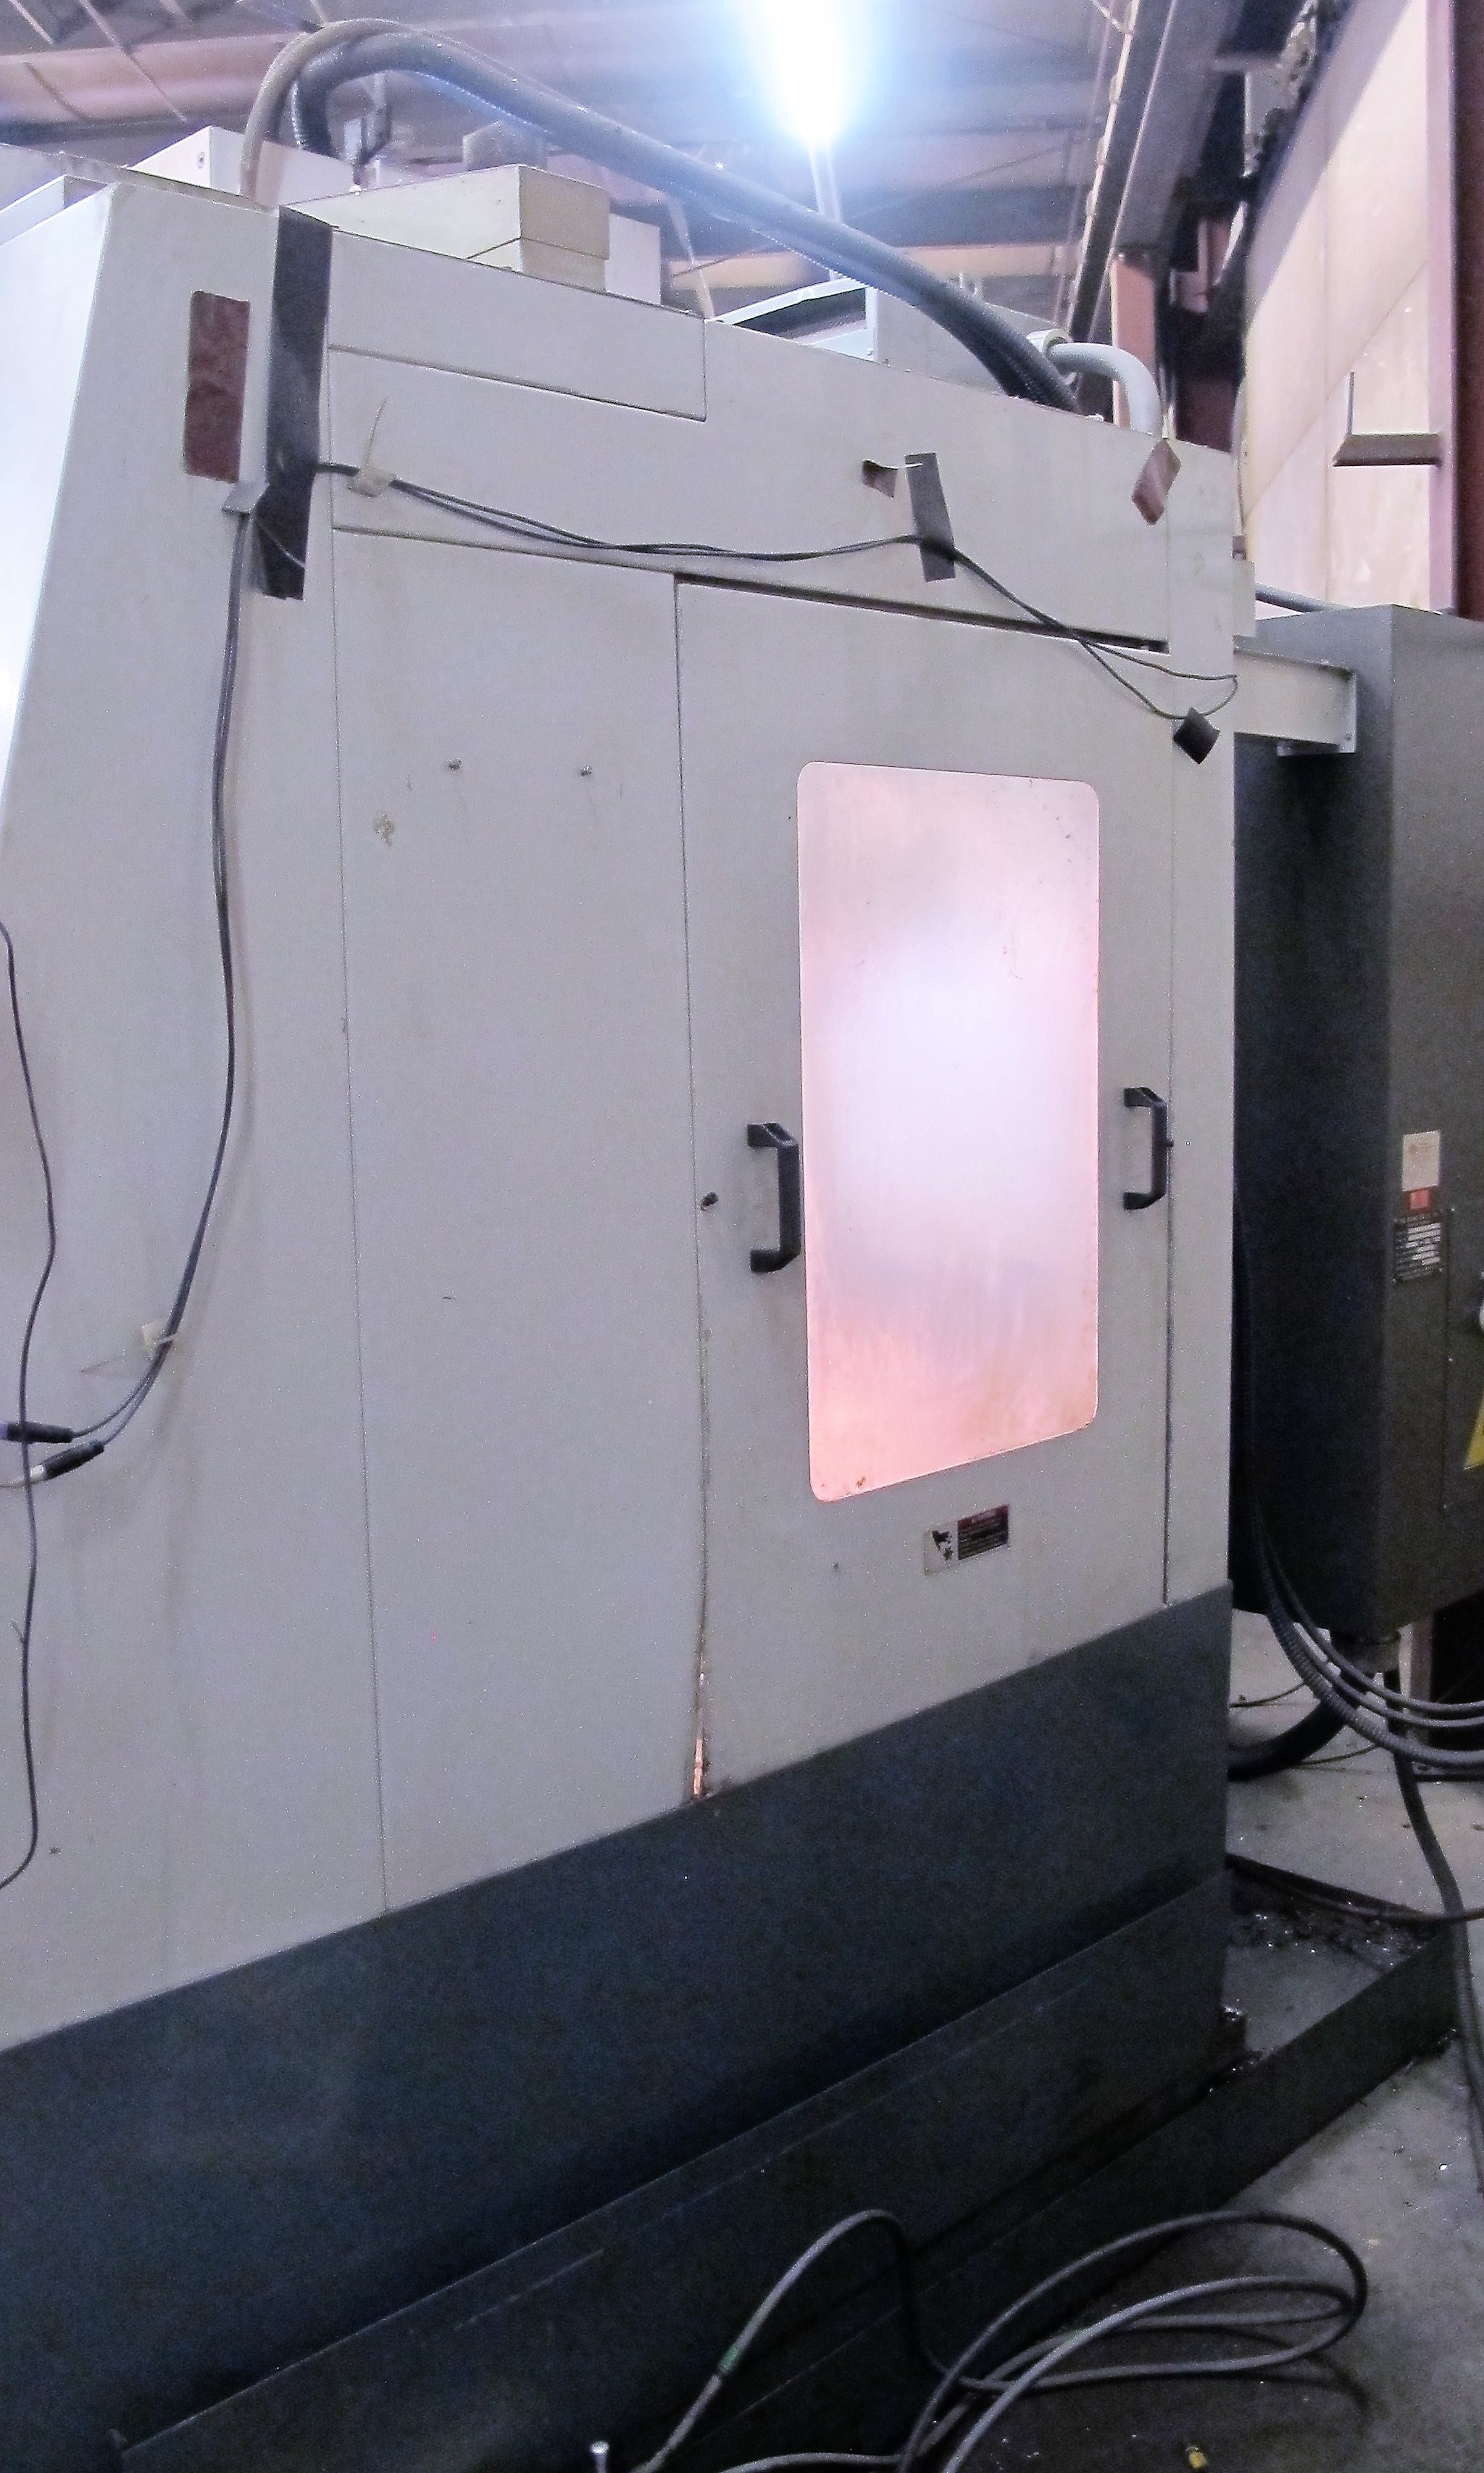 "TREEVMC 800/20 CNC VERTICAL MACHINING CENTER, S/N TS80900014U, PC-2100 CNC CONTROL, ATC, 25"" x - Image 9 of 16"